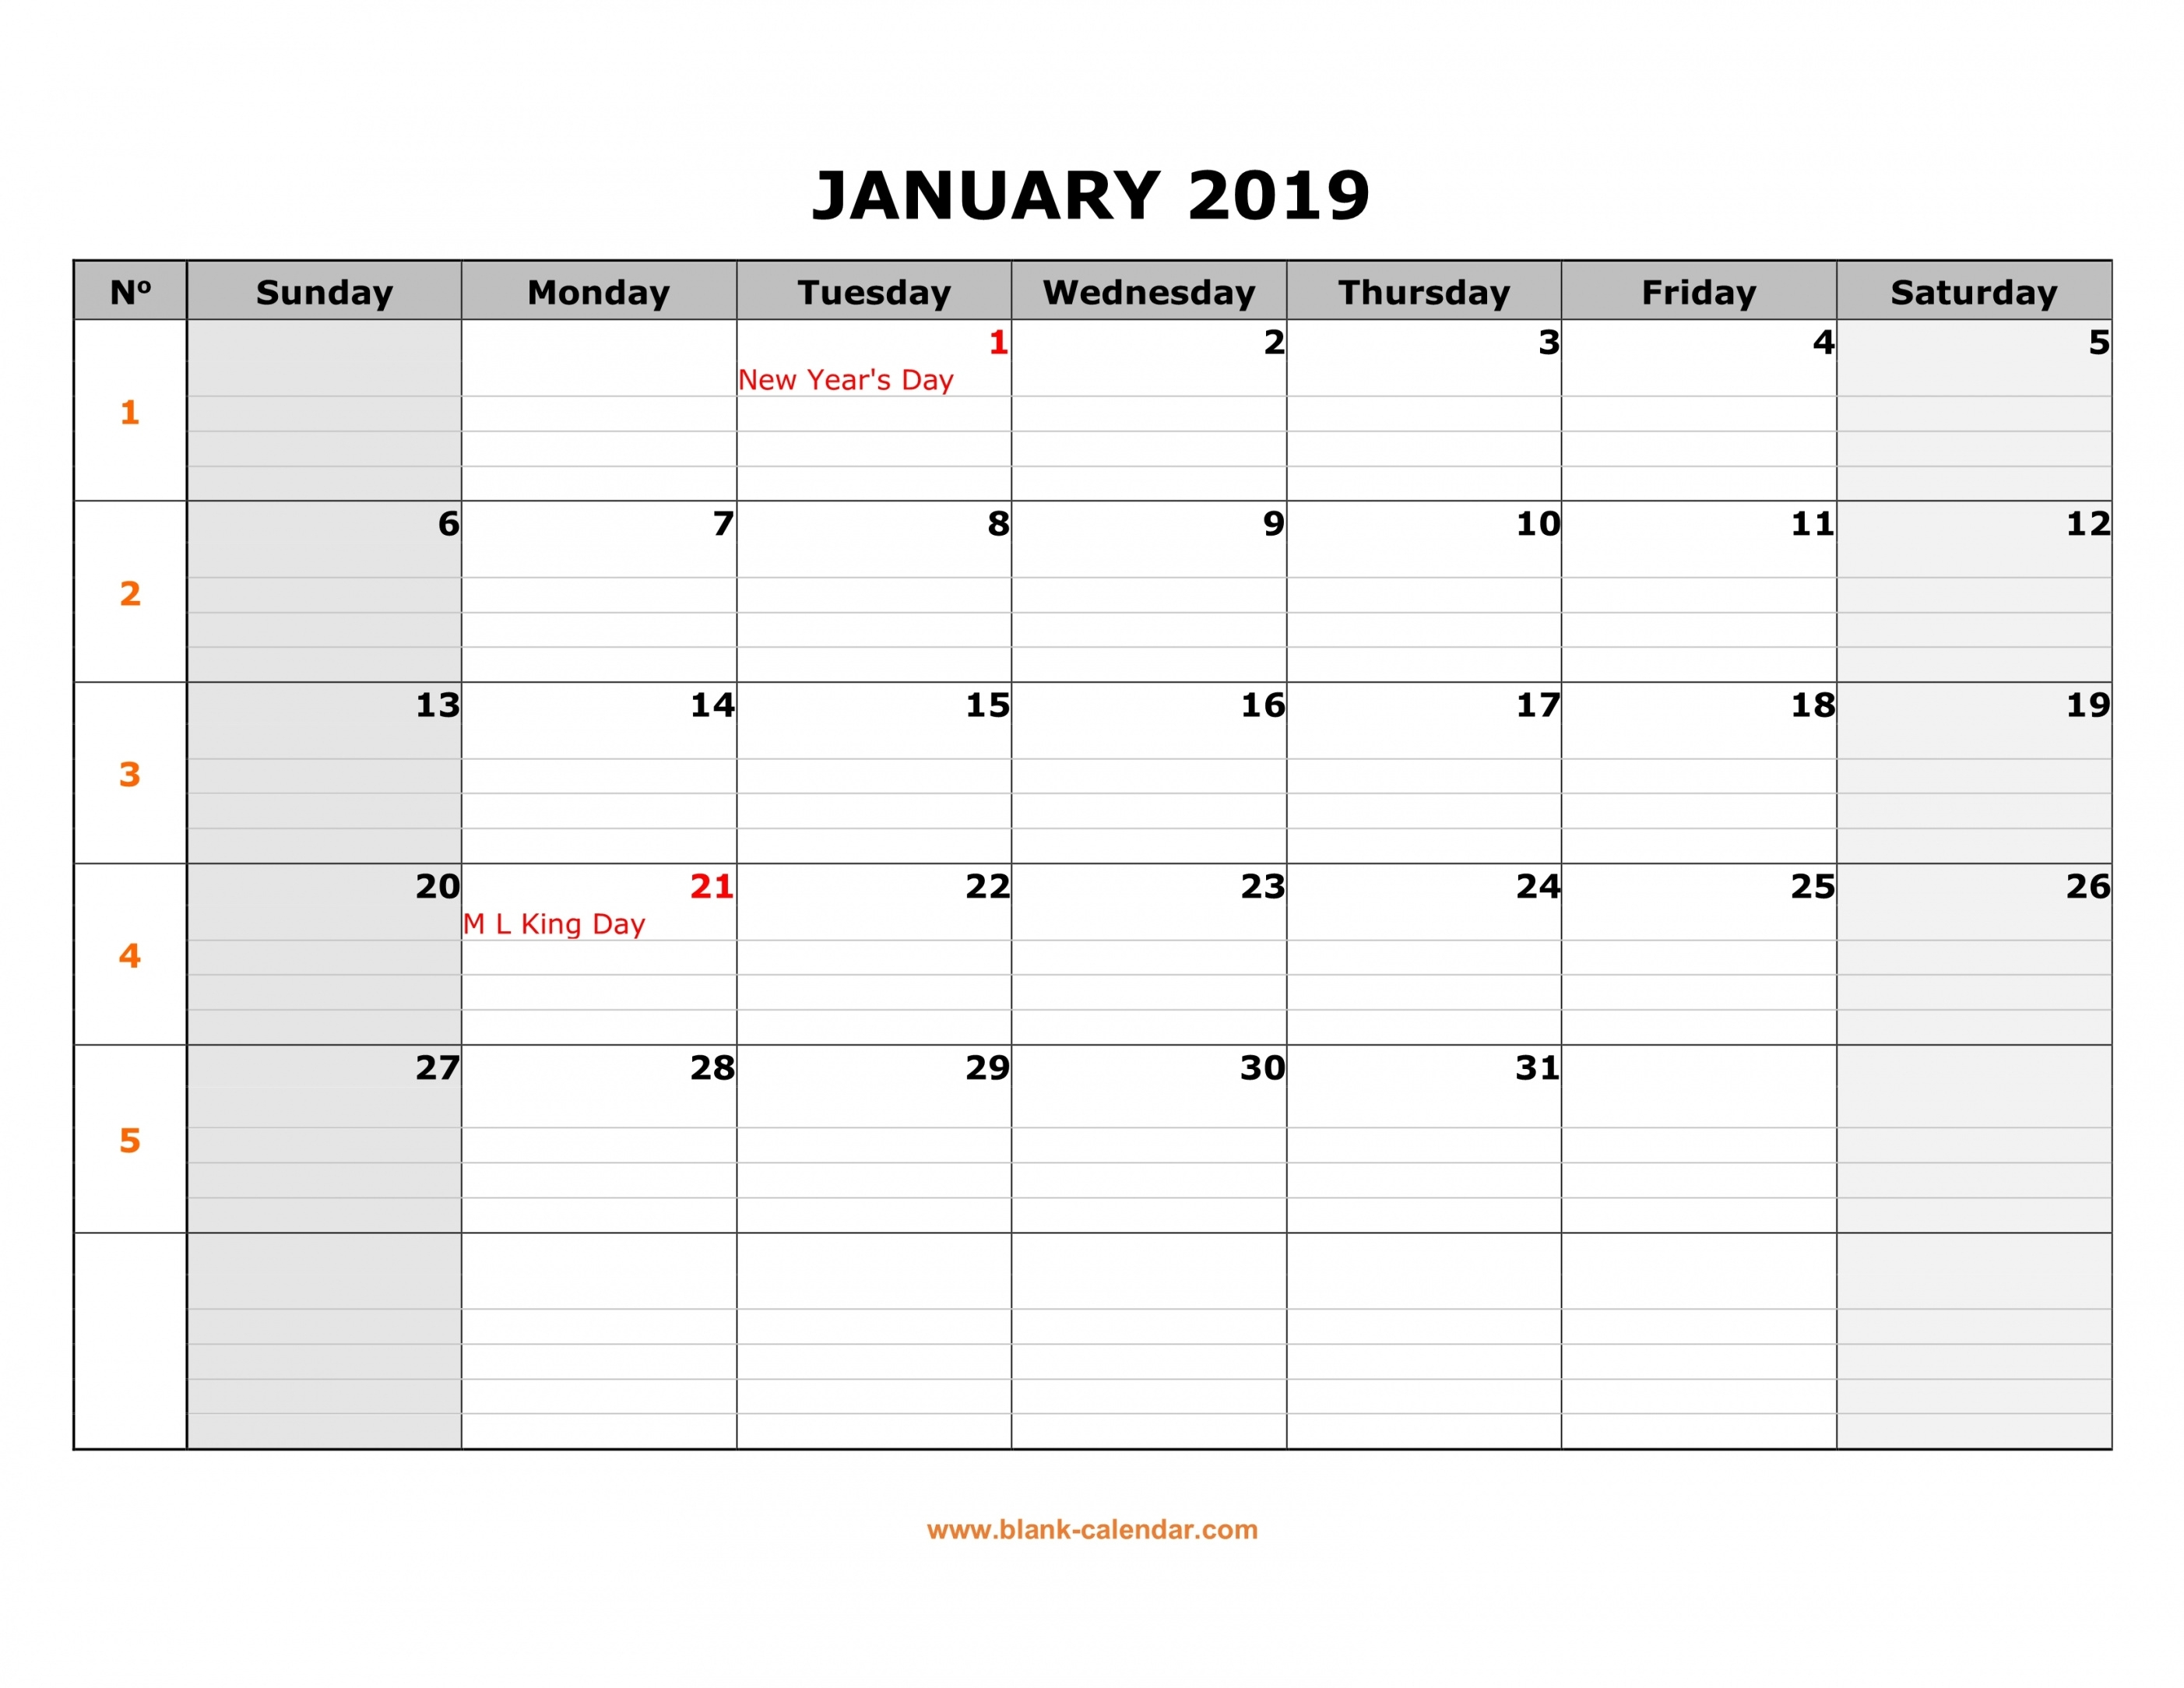 Free Download Printable Calendar 2019, Large Box Grid, Space For inside Large Box Printable Calendar 2020 Google